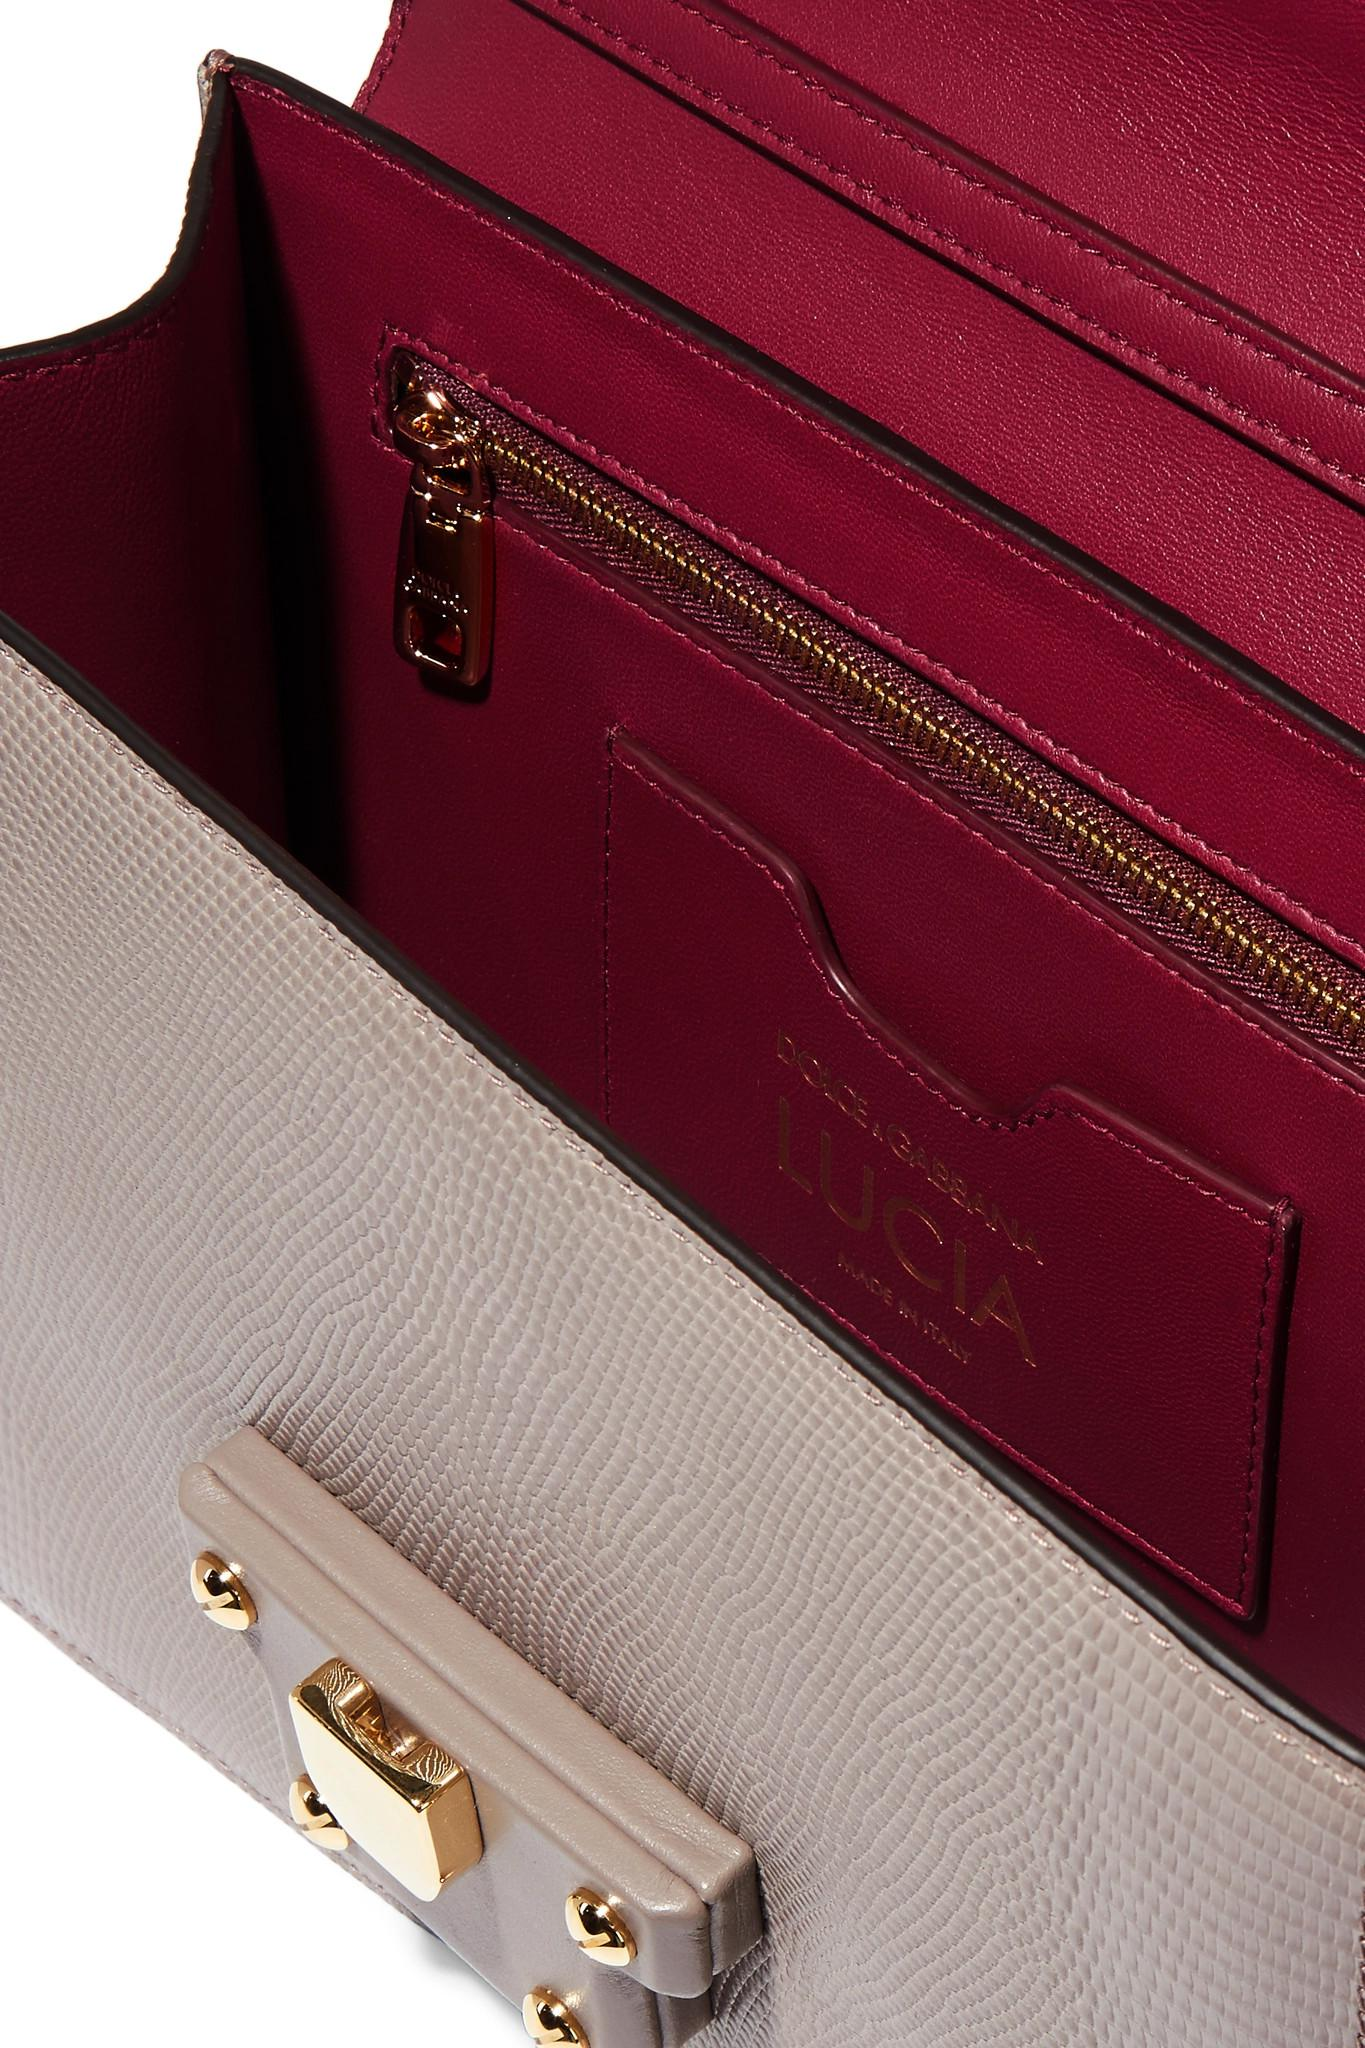 dolce gabbana woman lizard effect leather shoulder bag gray new style 5e800  bfce6 3099779aa3